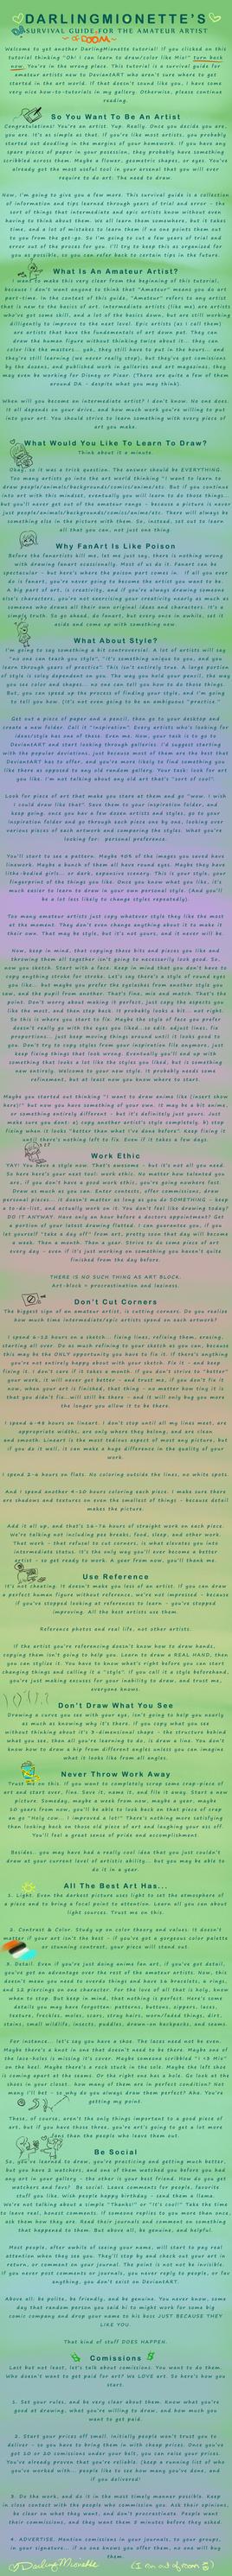 Art Survival Guide - Beginner by DarlingMionette